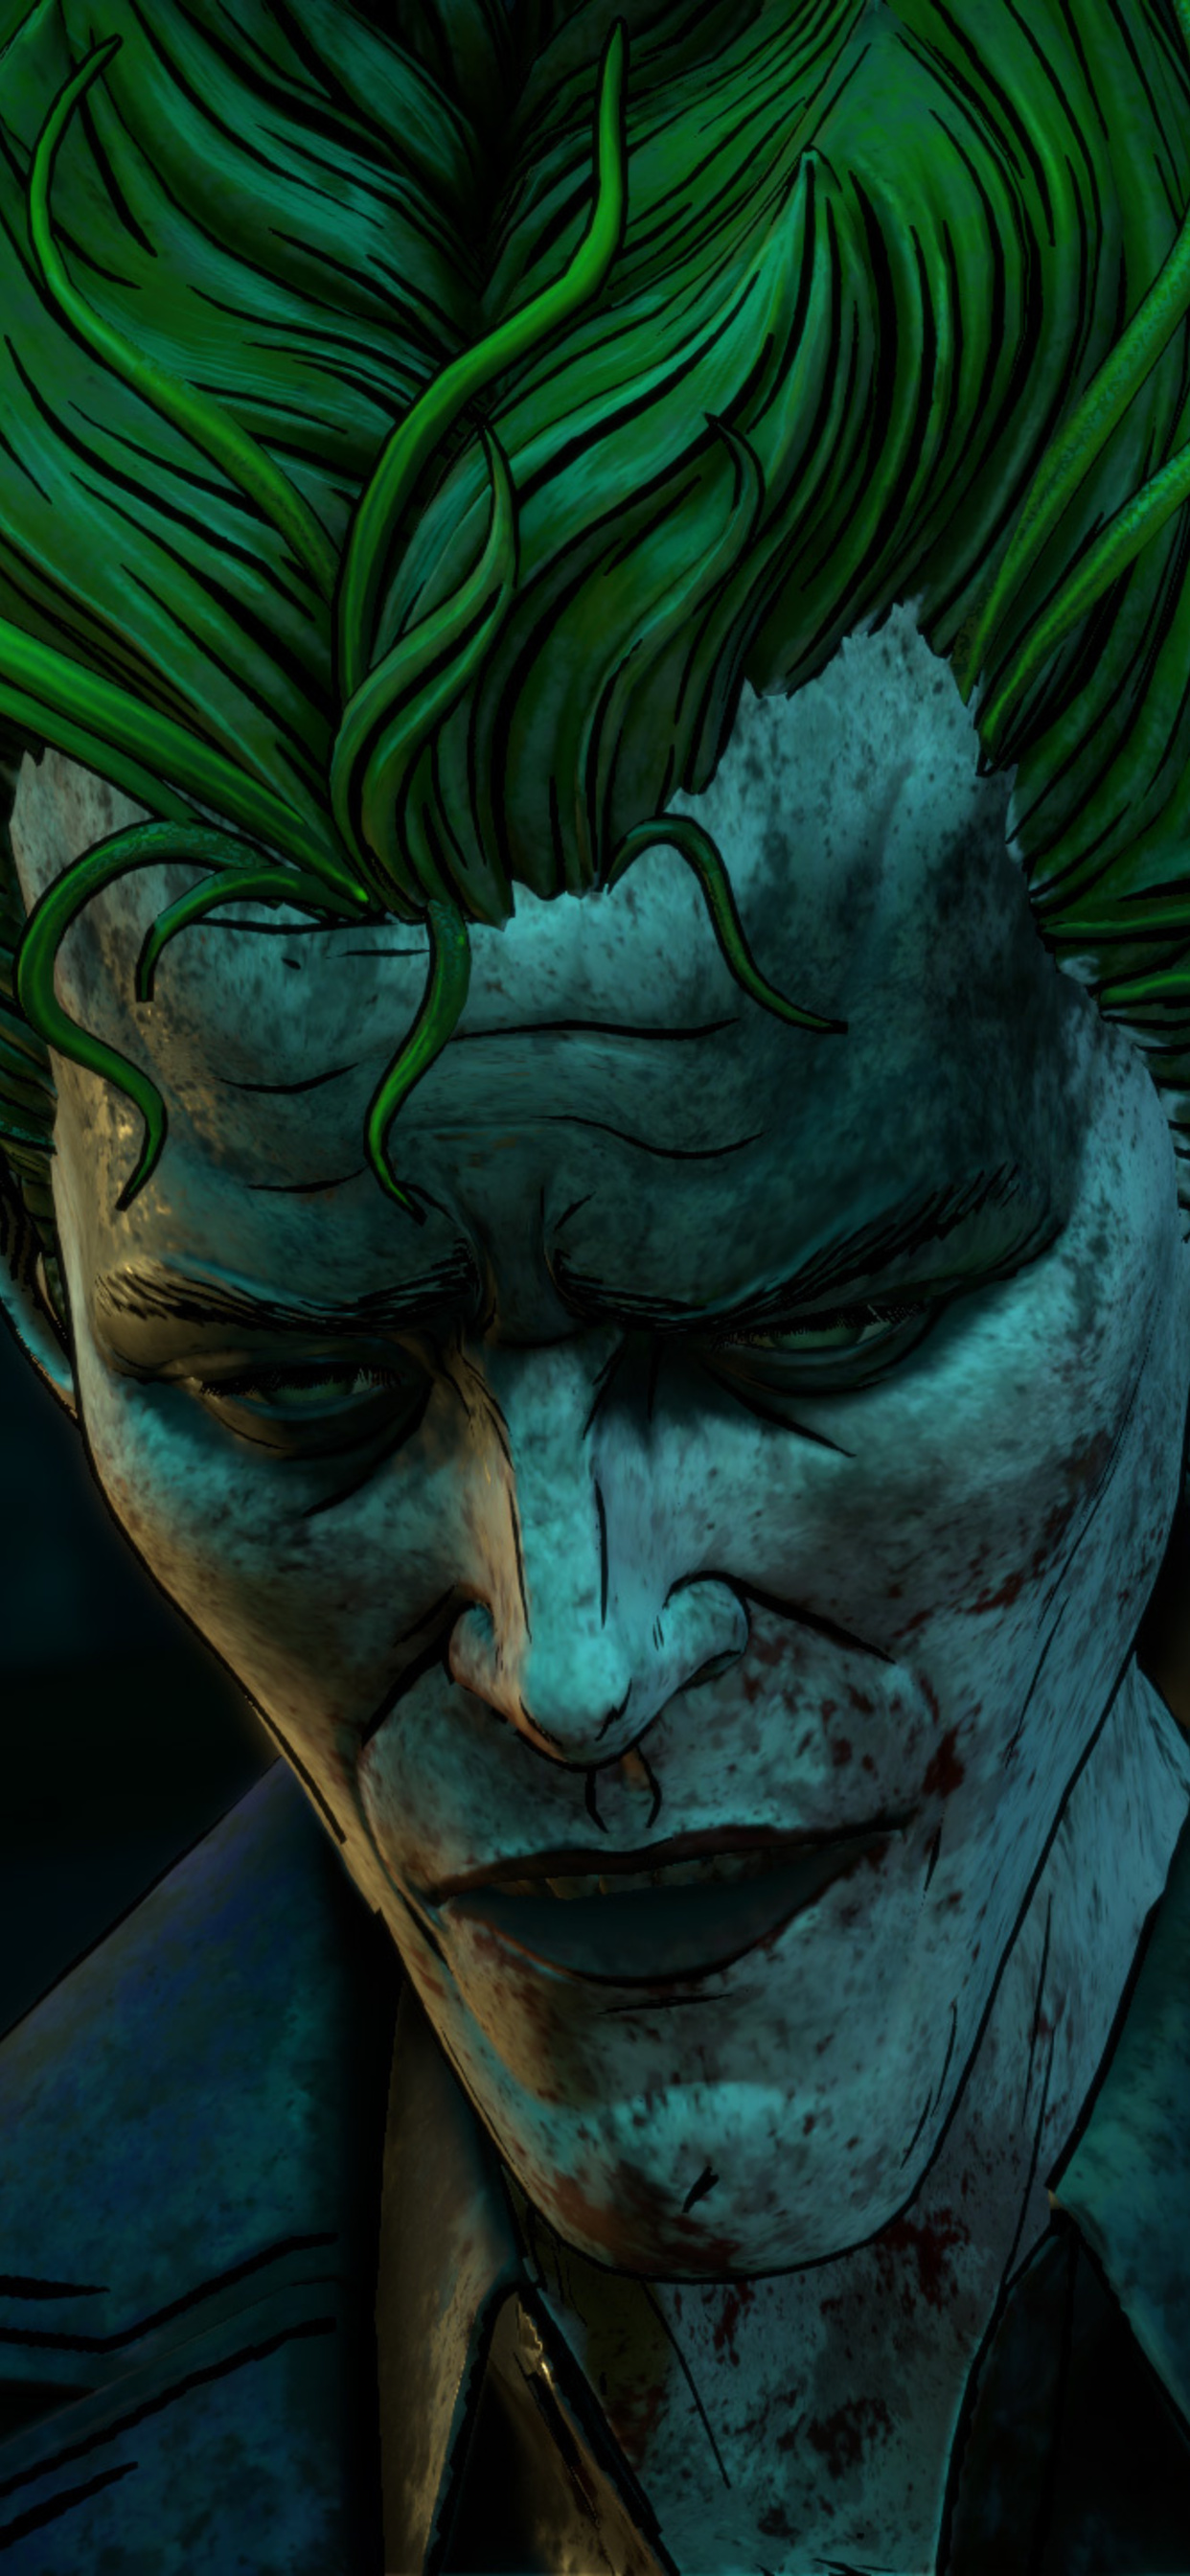 1242x2688 Joker Batman A Telltale Game Series Iphone Xs Max